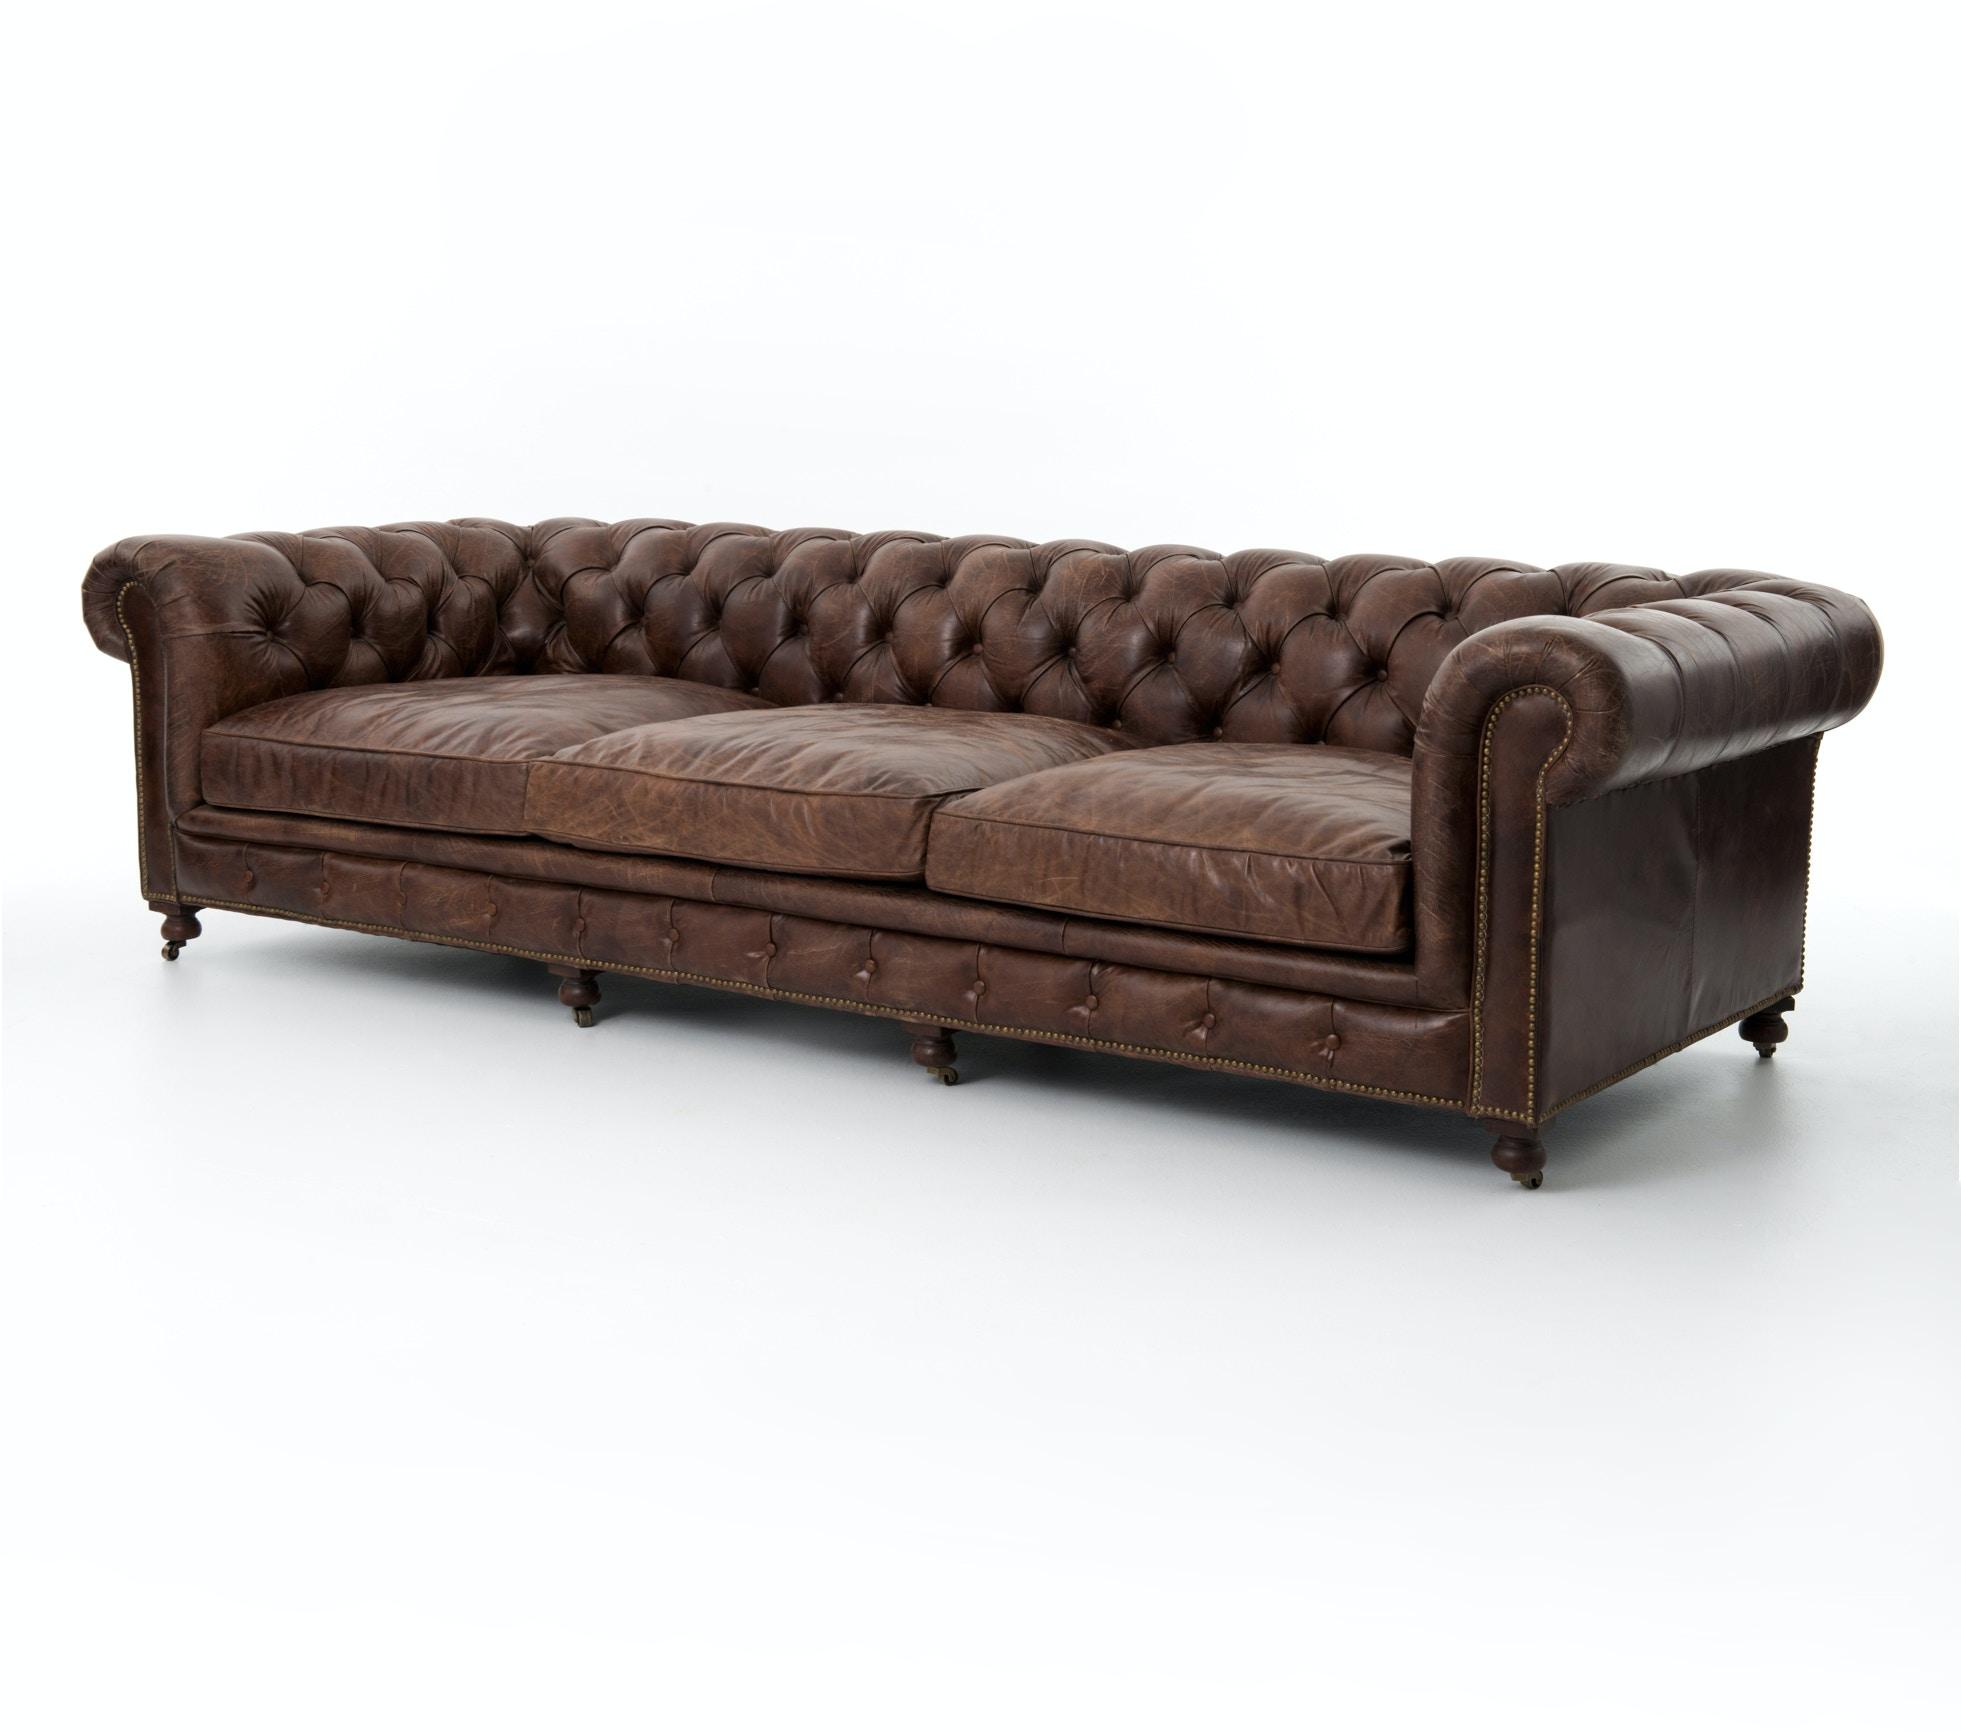 Four Hands Furniture Ccar 35 Living Room Conrad 118 Sofa Cigar